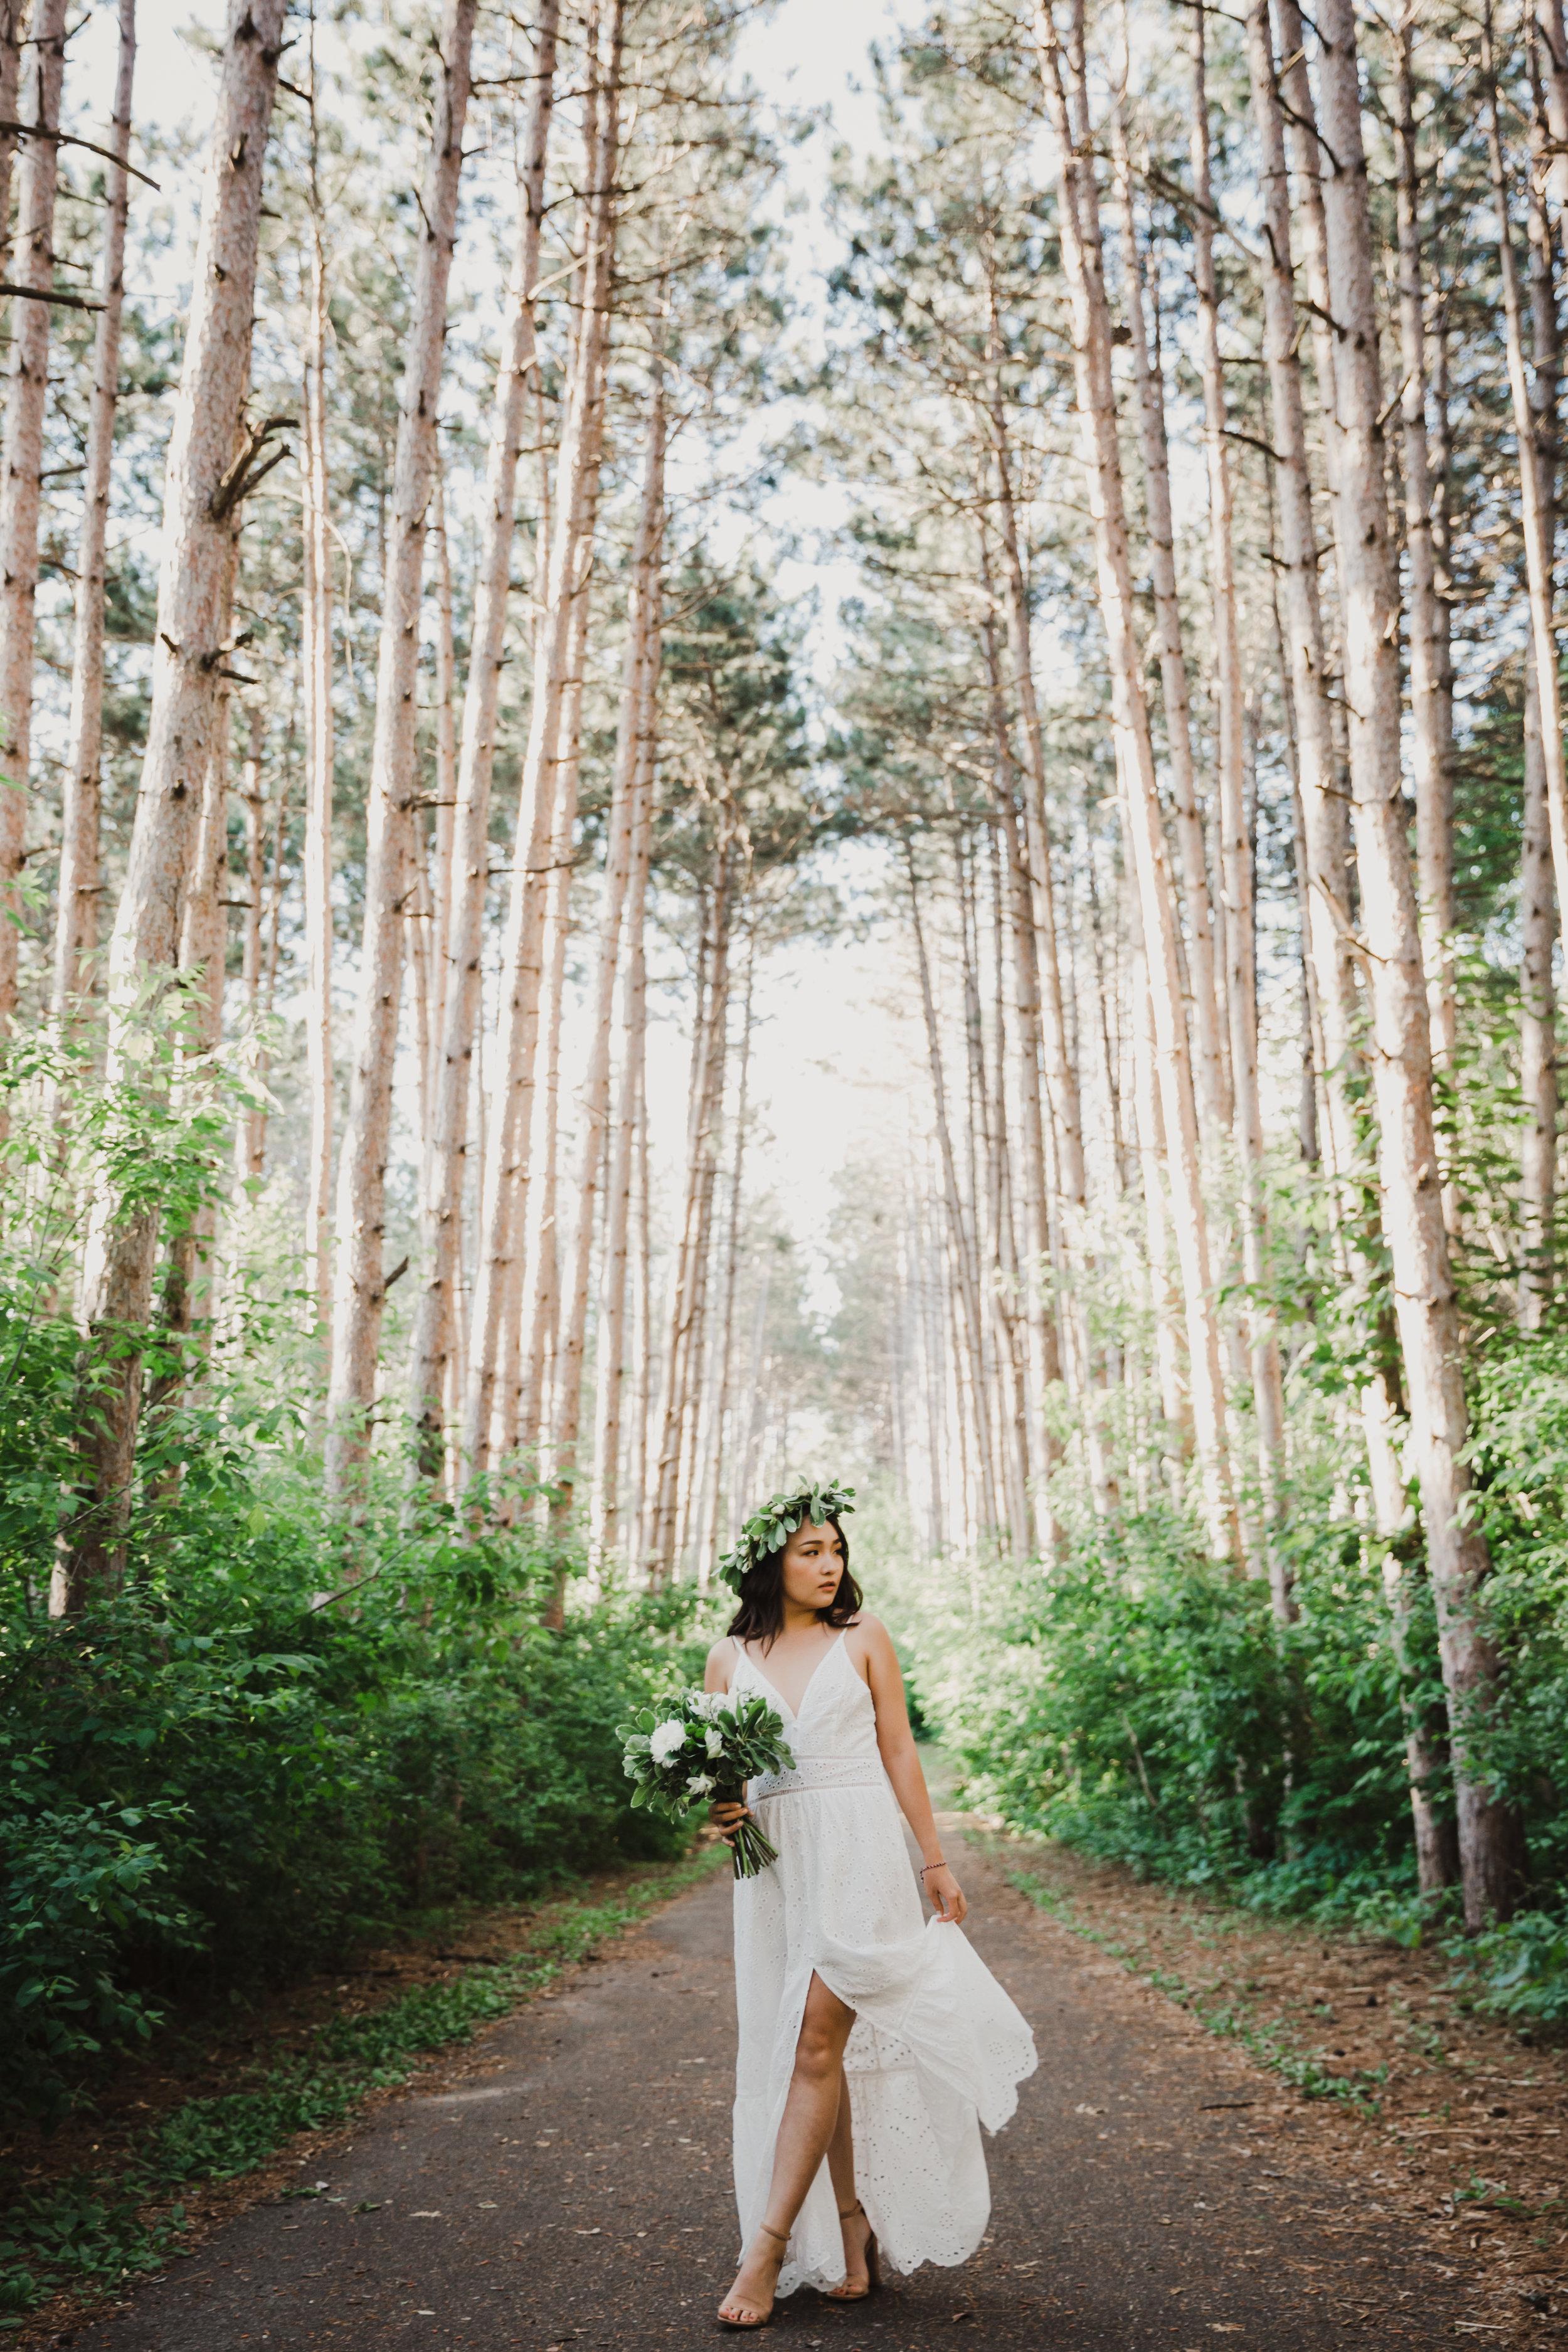 WeddingSM-6.jpg